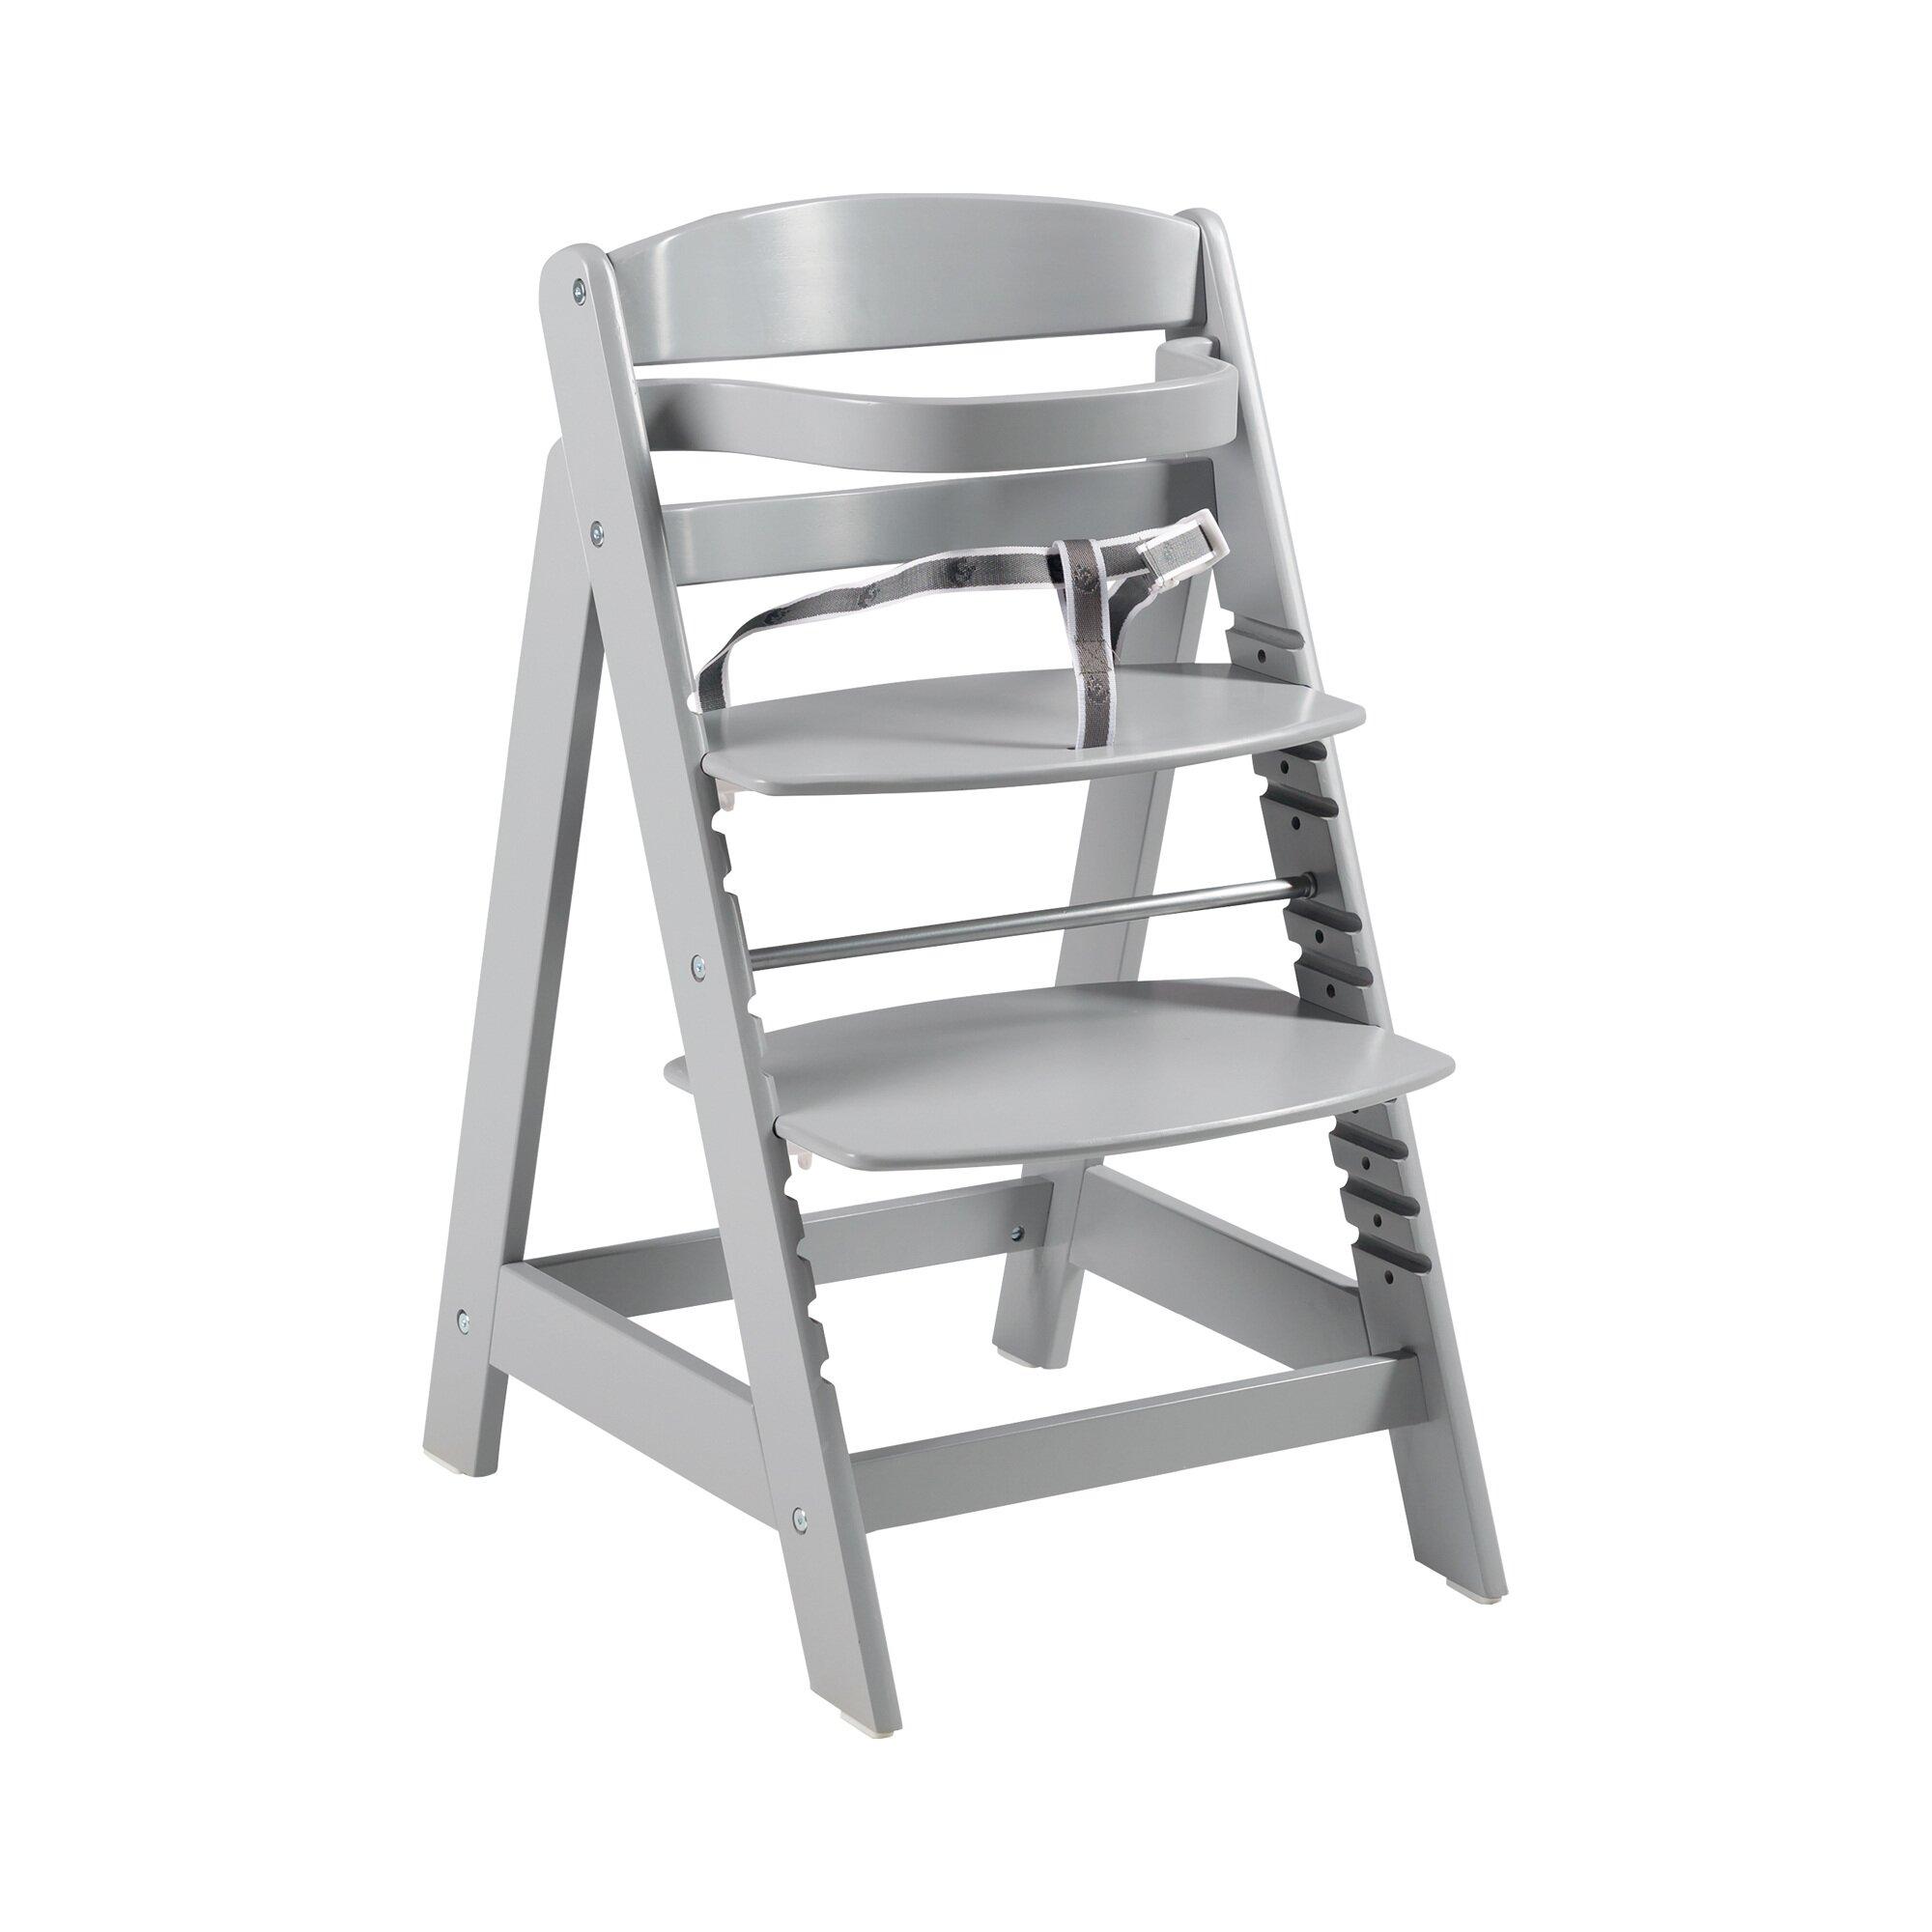 Roba Treppenhochstuhl Sit up Click